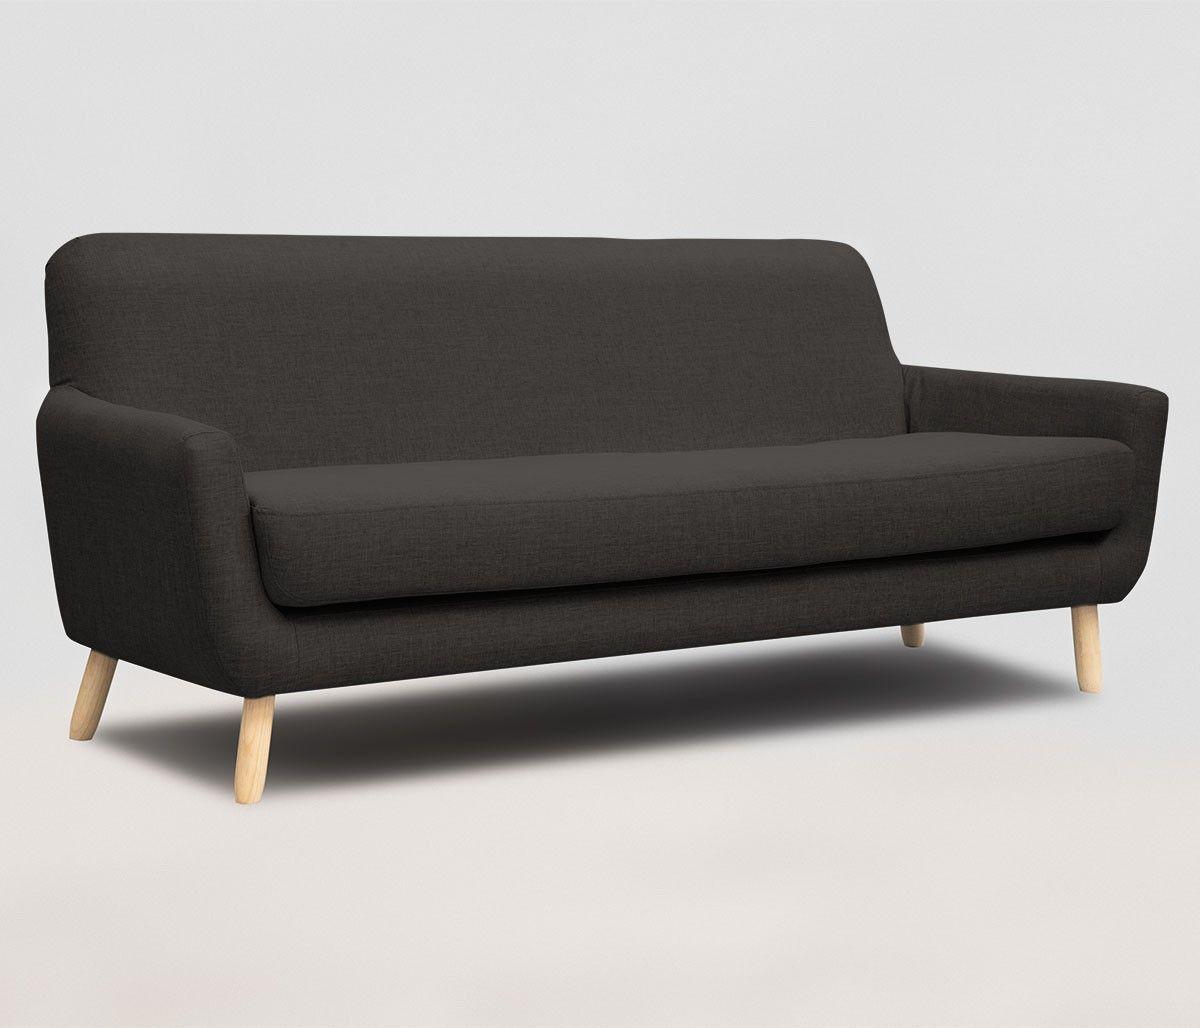 Sofá Jitotol 3 Cuerpos - Sentarse - Muebles   Mid-Century Modern ...